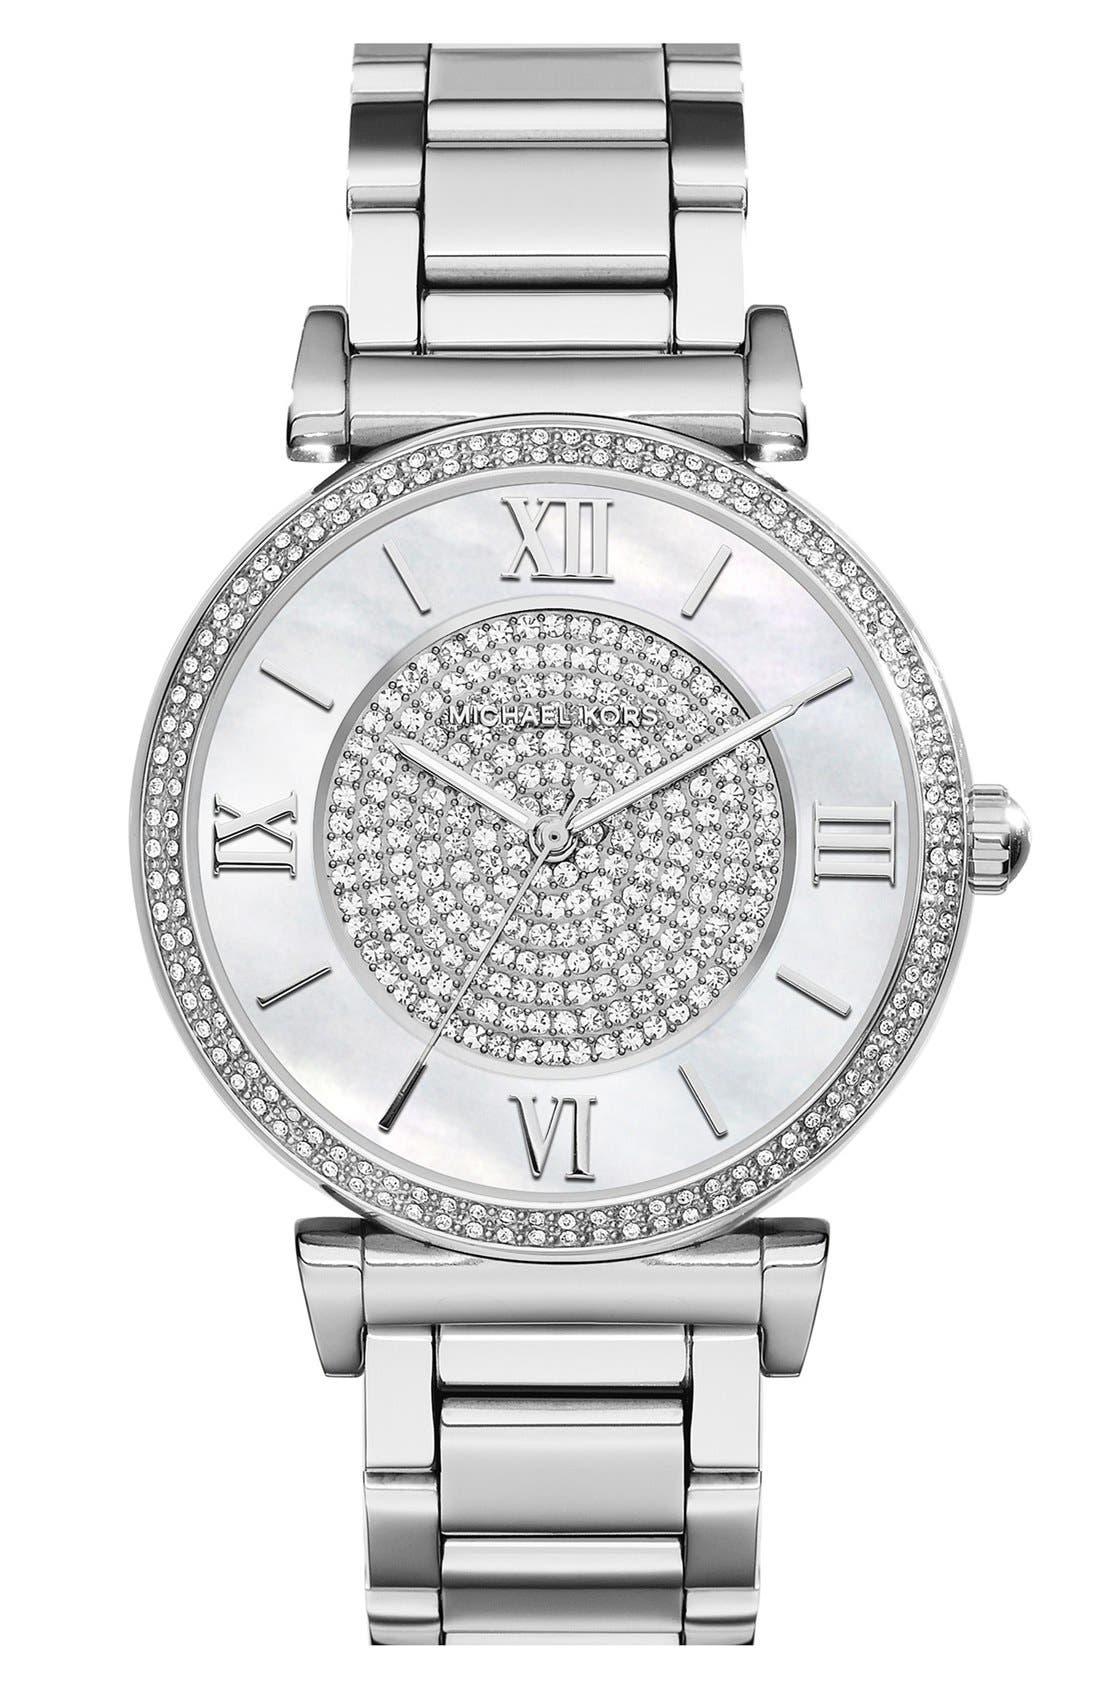 Main Image - Michael Kors 'Caitlin' Crystal Dial Bracelet Watch, 38mm